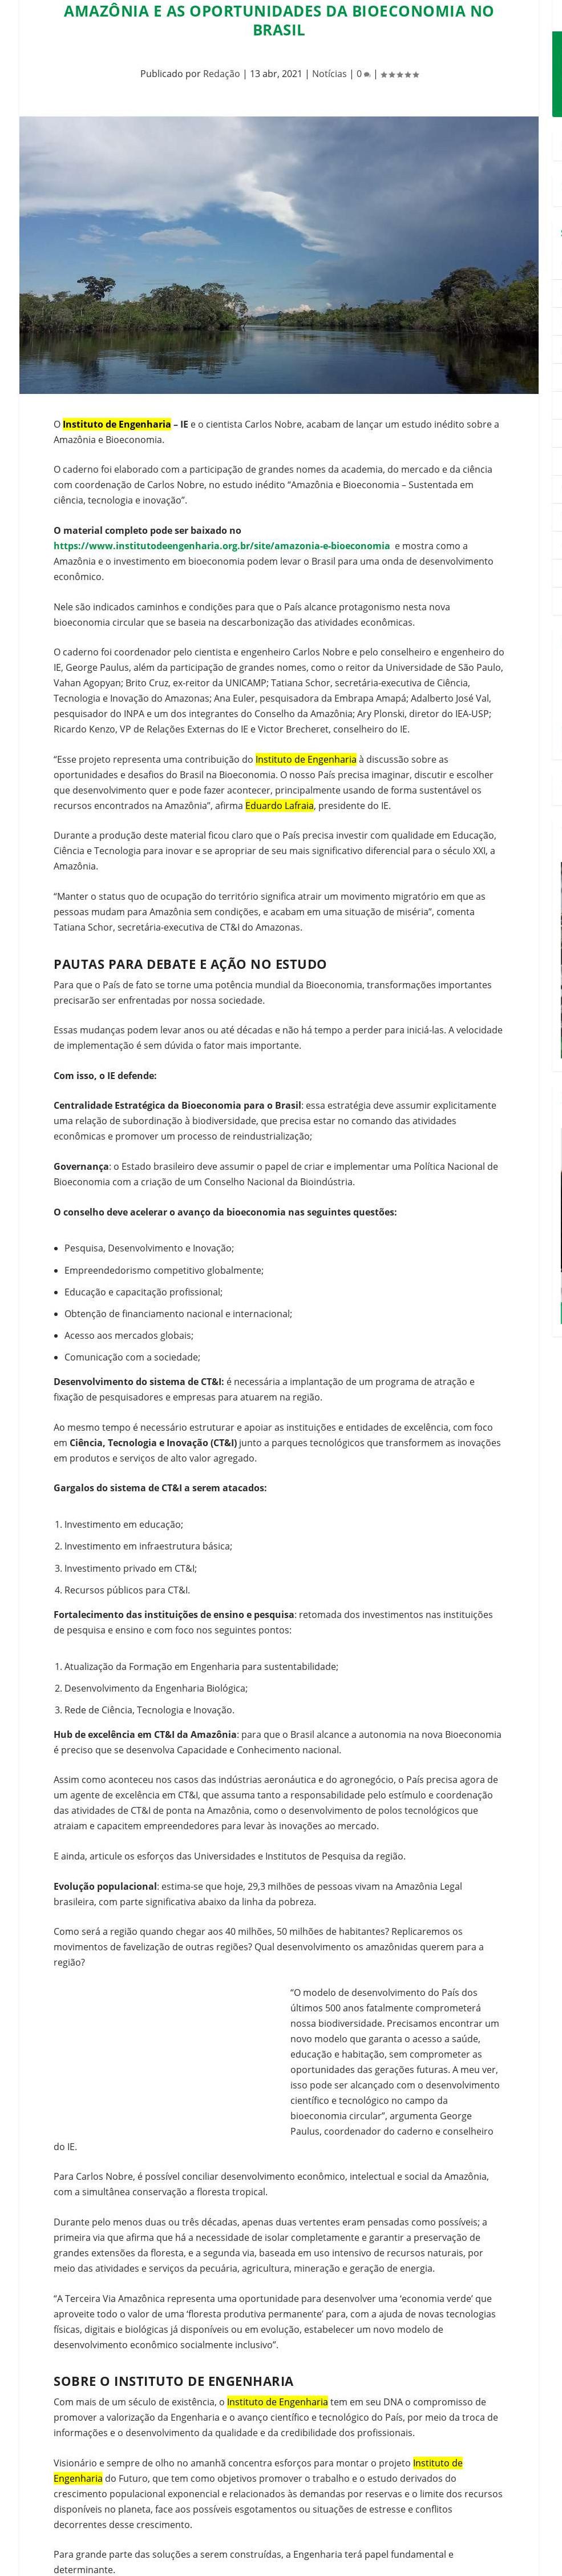 Amazônia e as oportunidades da Bioeconomia no Brasil - Revista Preven